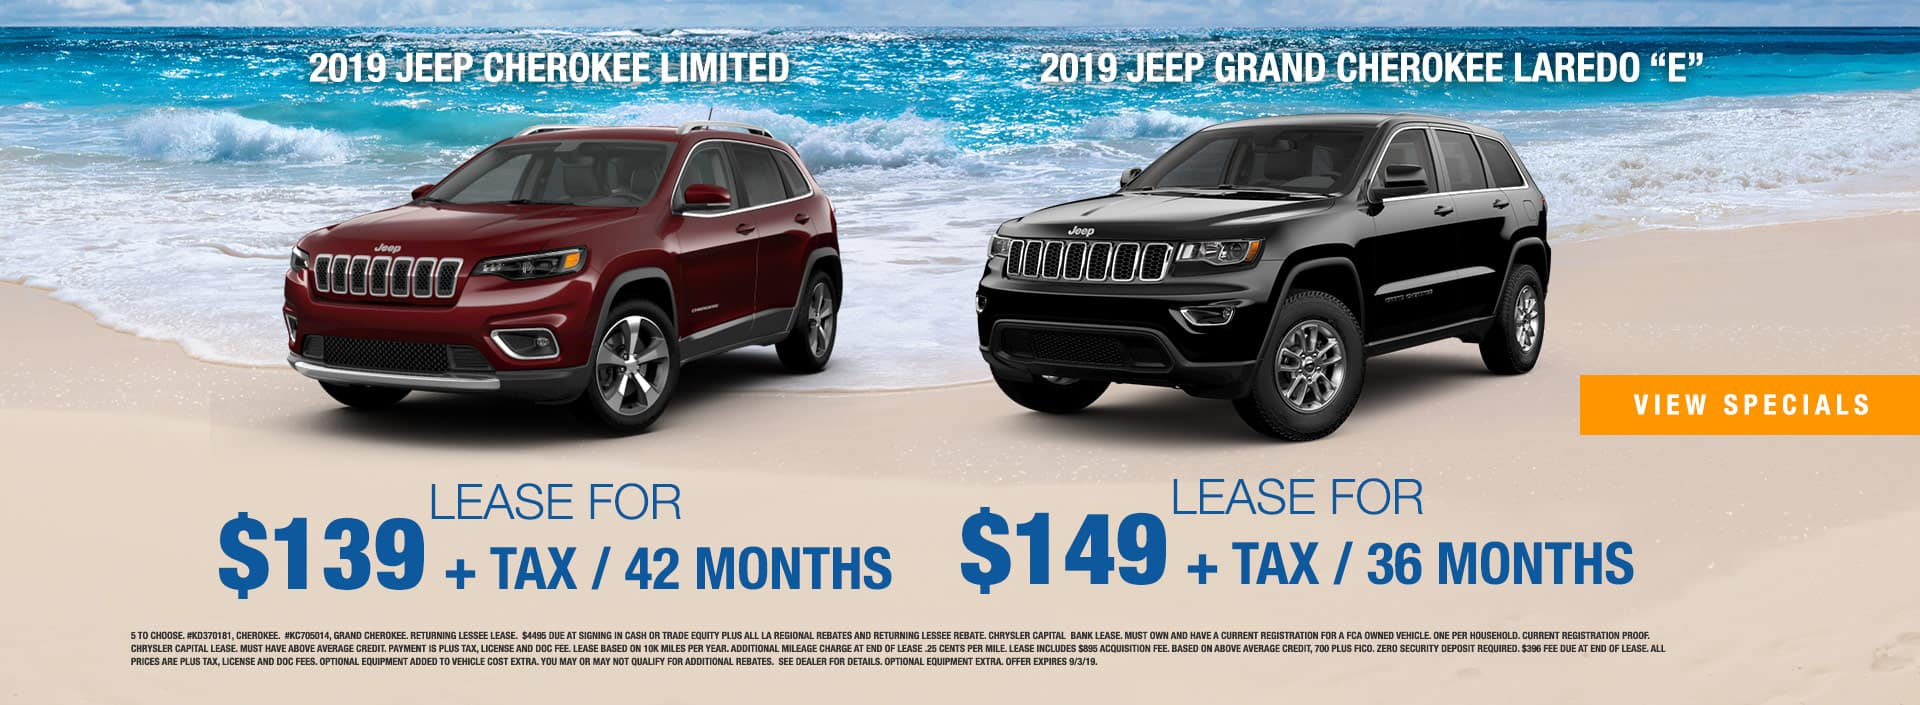 Jeep Dealers Near Me >> Scott Robinson Chrysler Dodge Jeep Ram Jeep Dealership Near Me